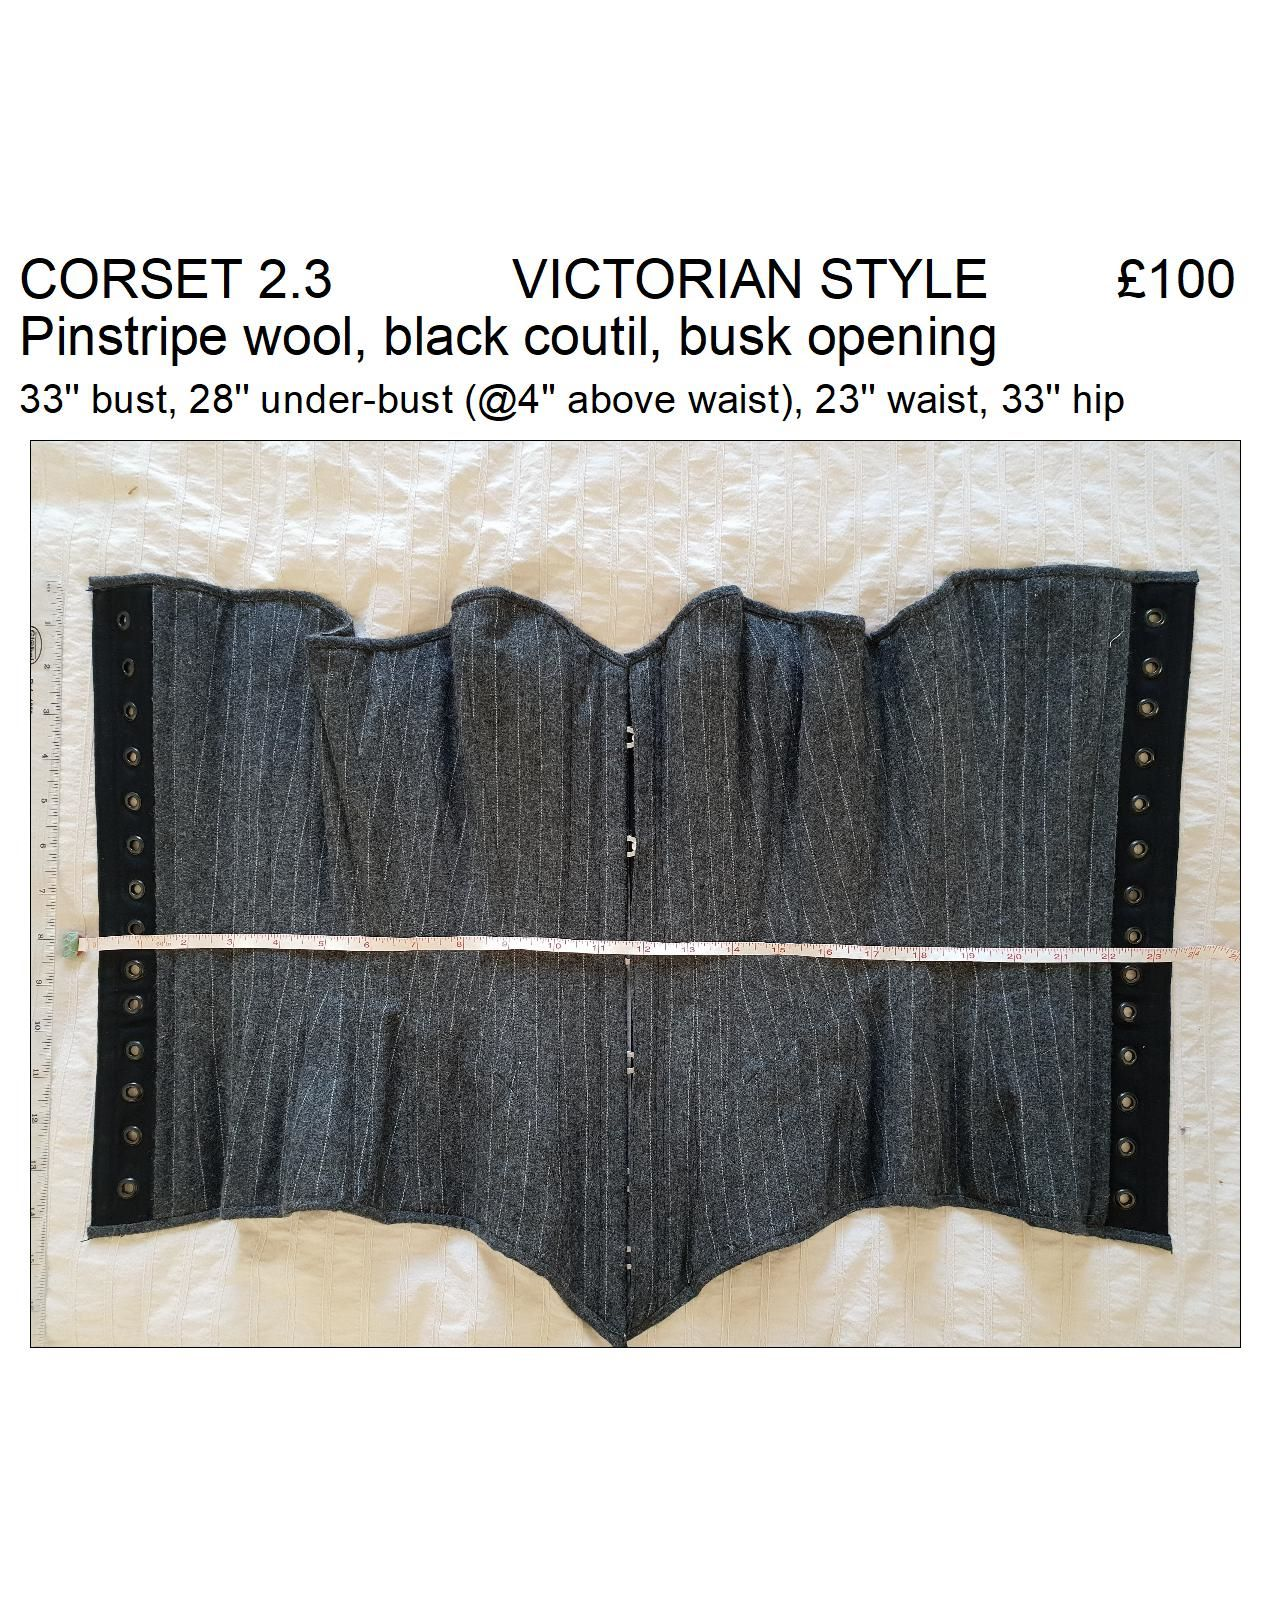 2.3 wool victorian